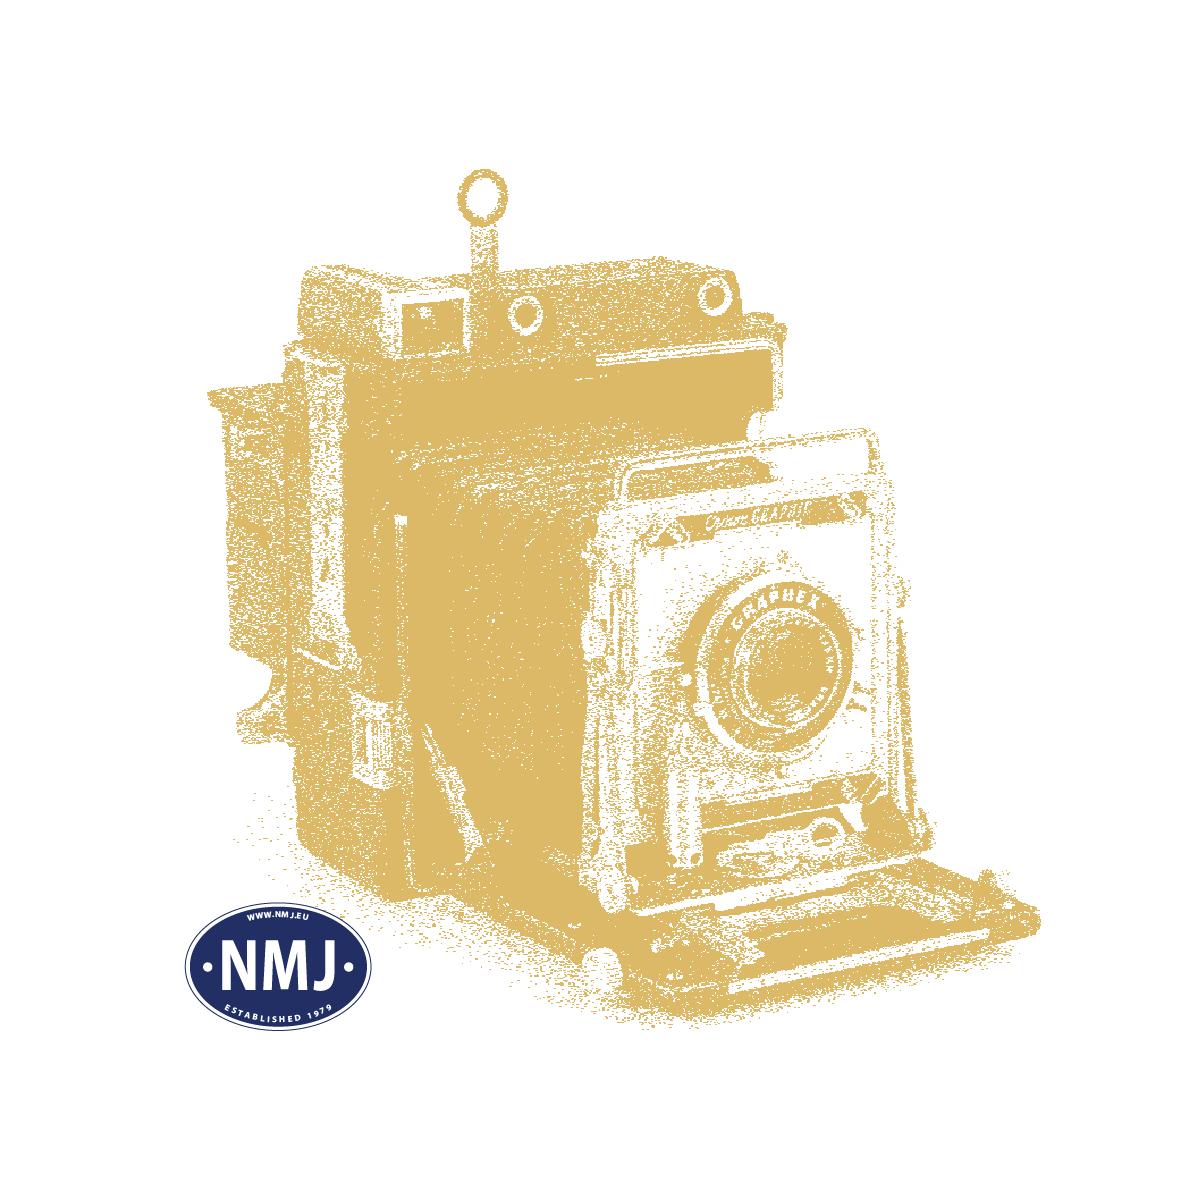 NMJT504.101 - NMJ Topline NSB His 210 2 496-7